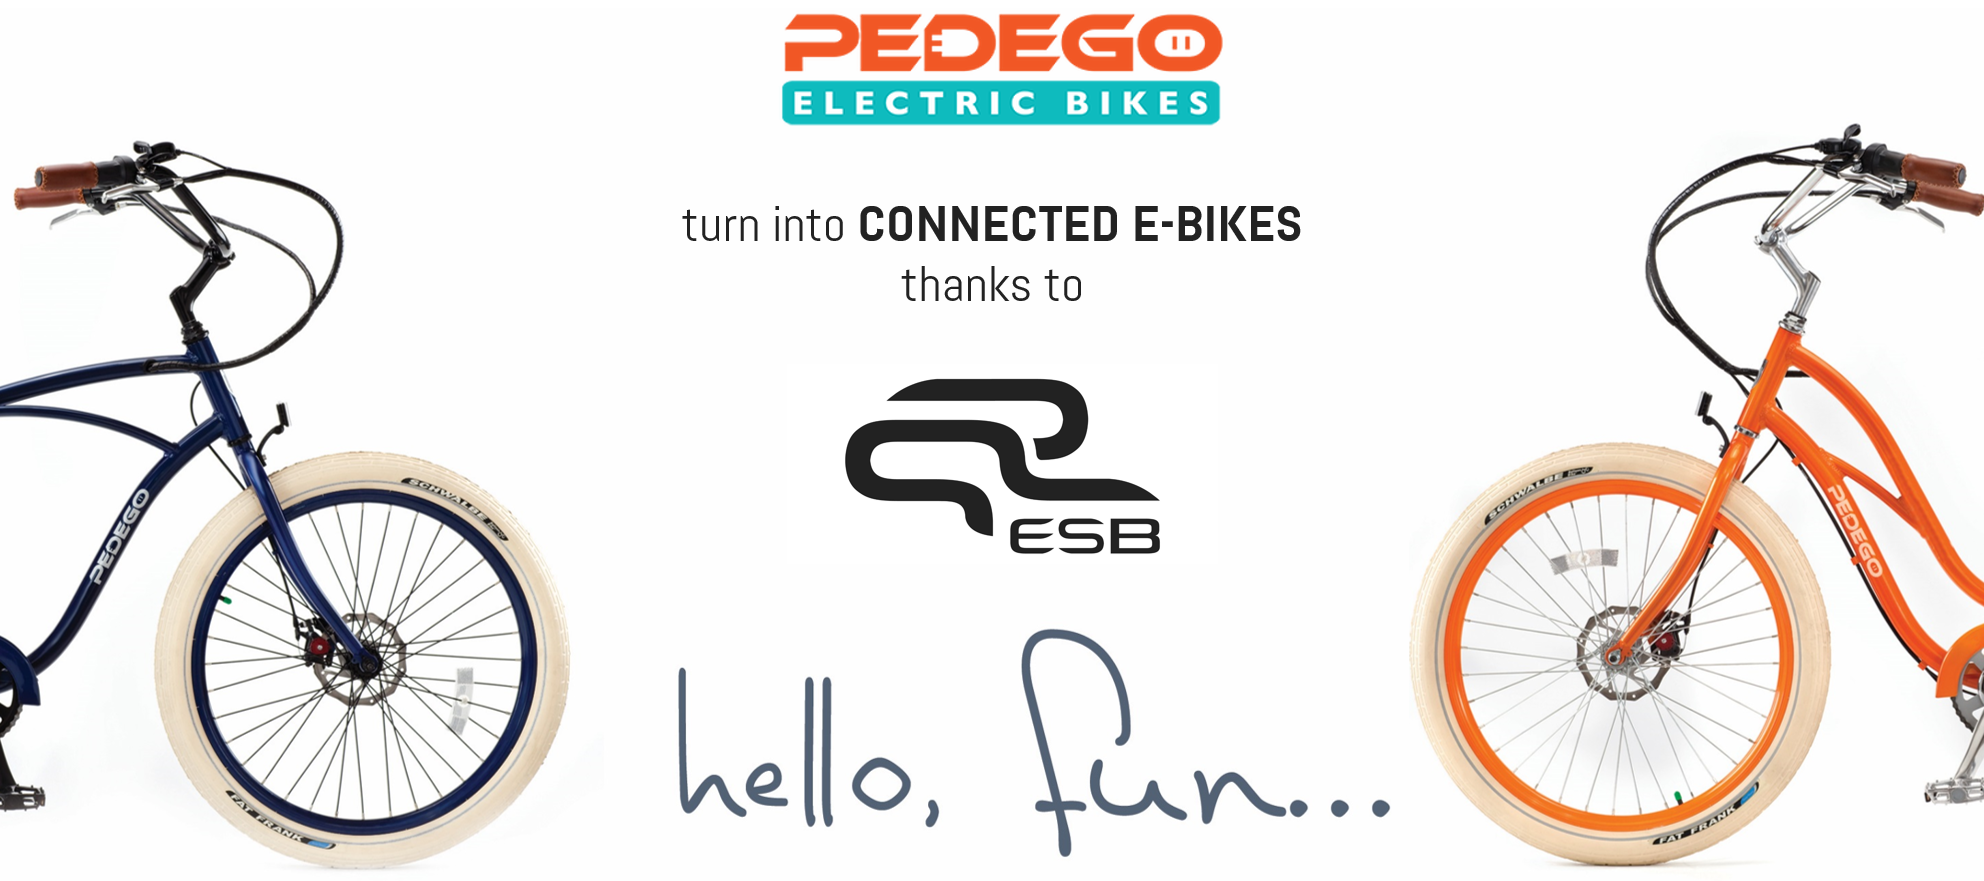 ESB_PEDEGO_Connected e-Bikes